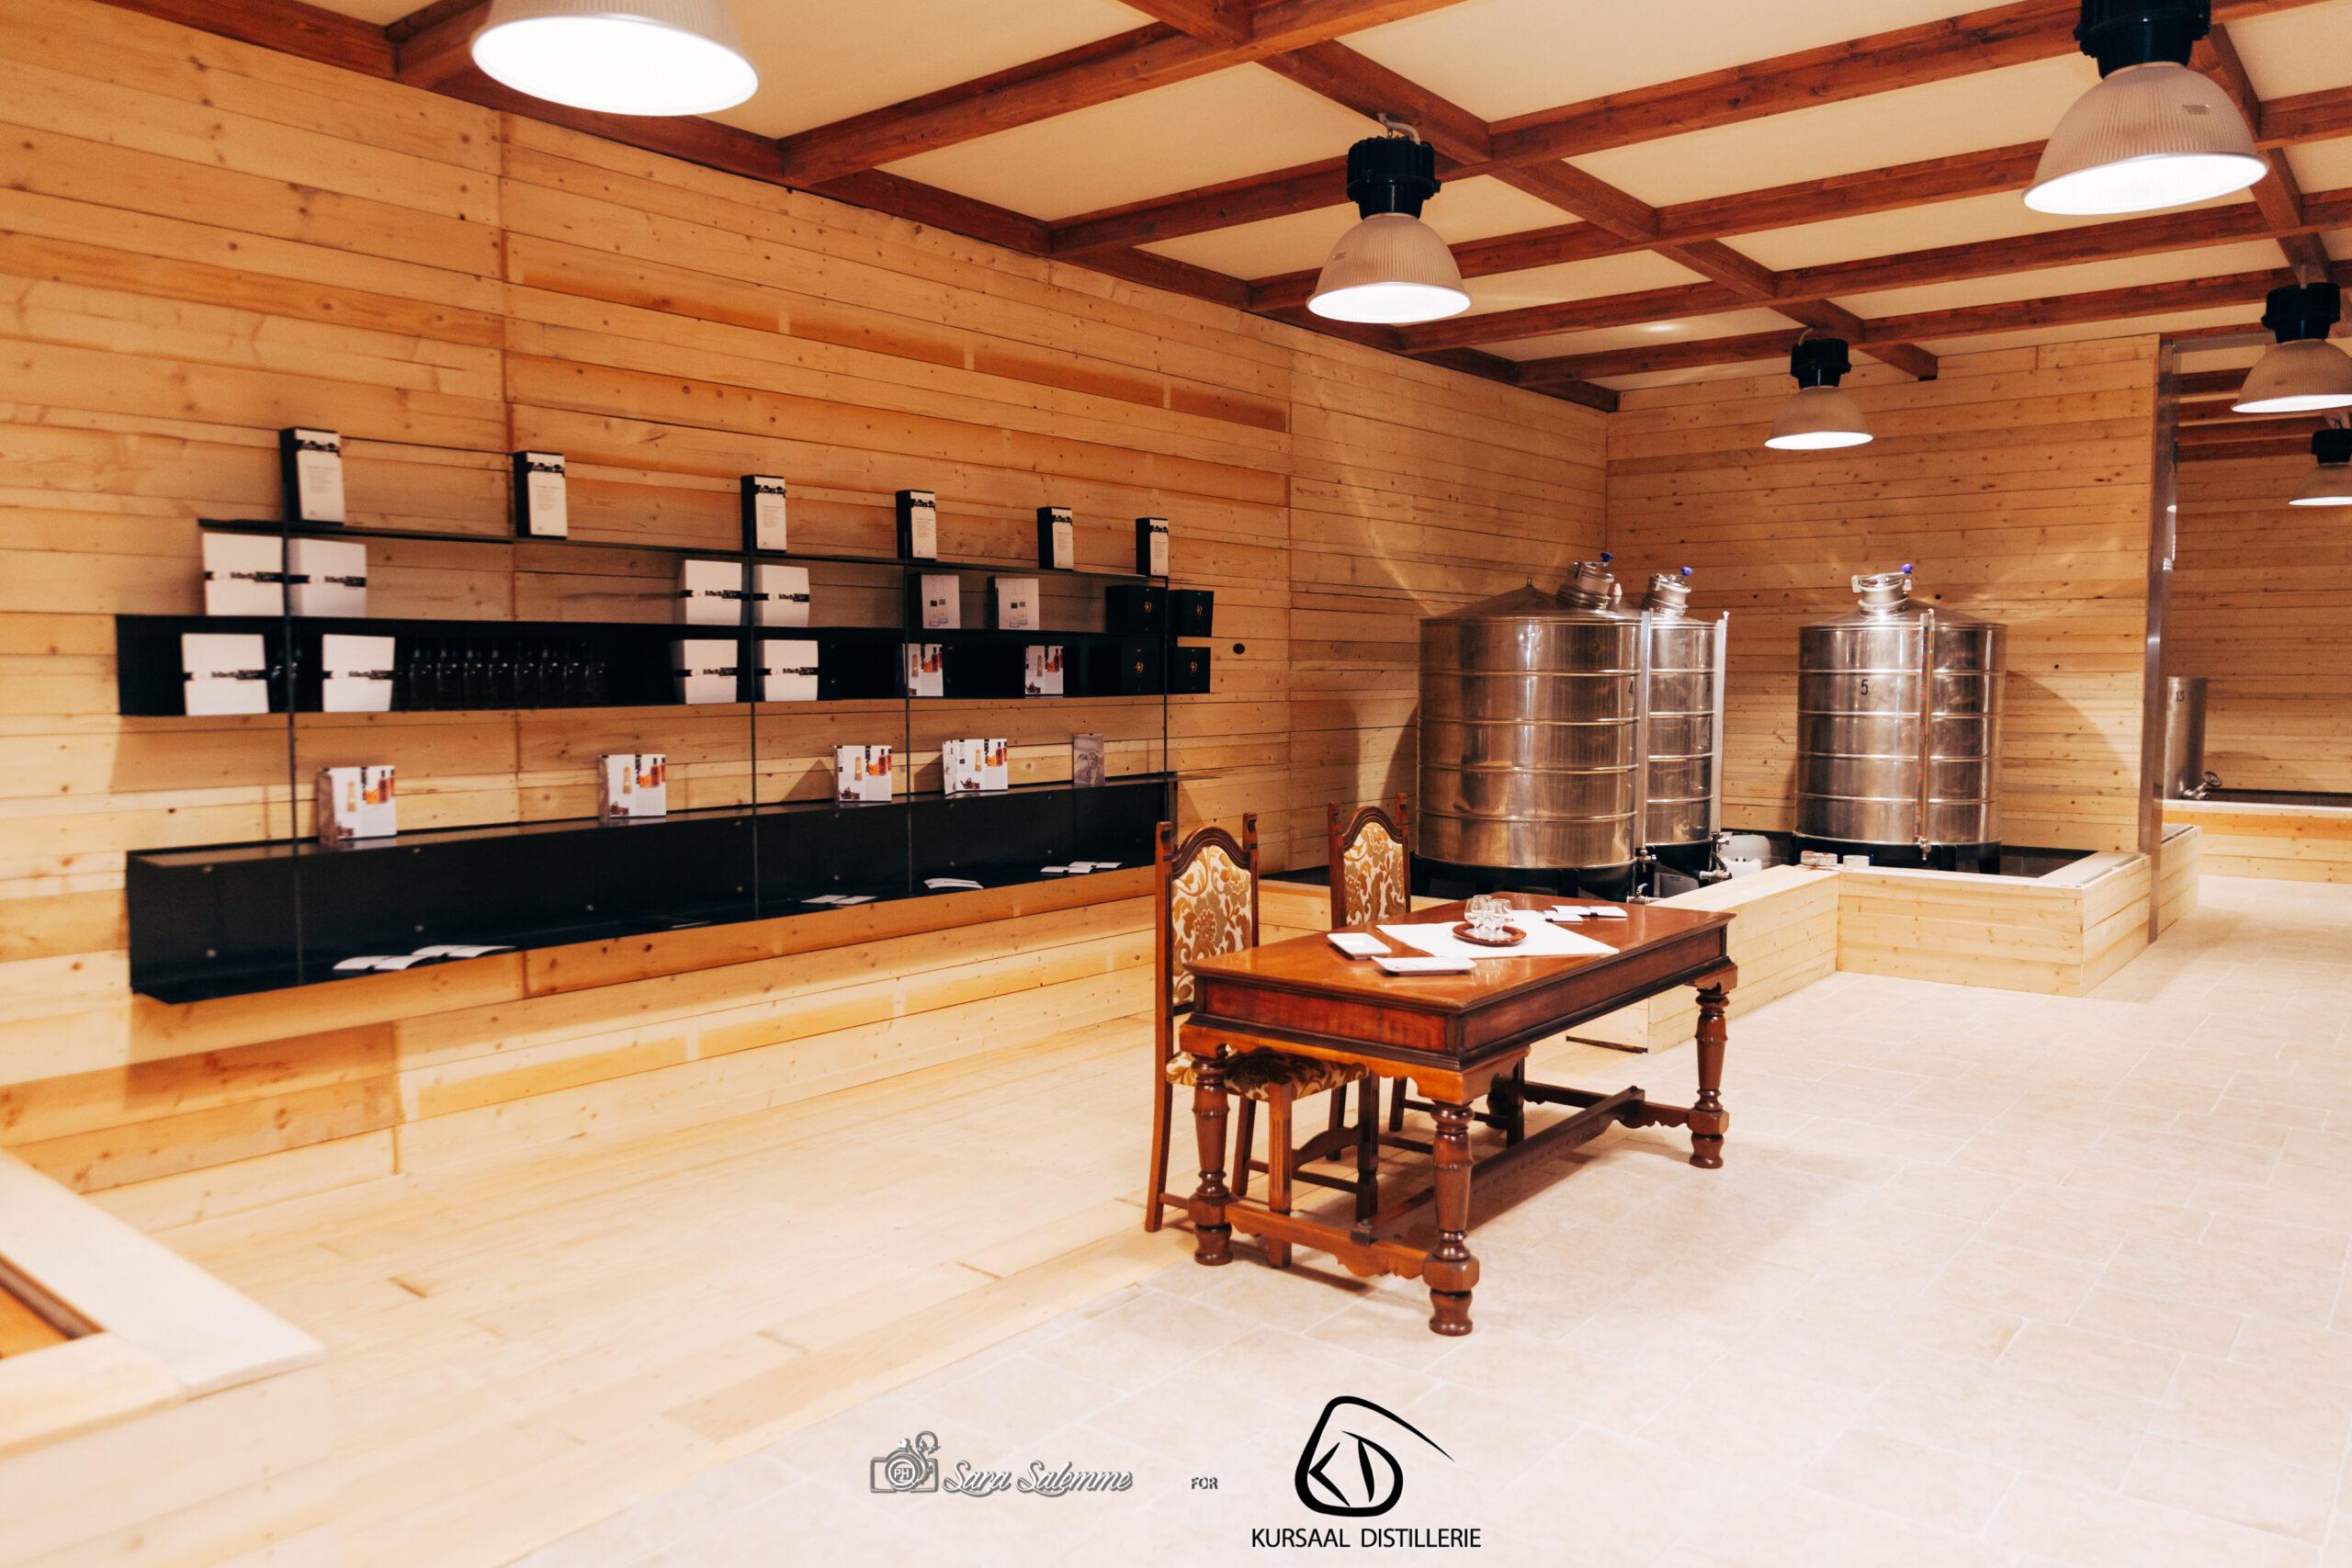 Cantina Kursaal Distillerie